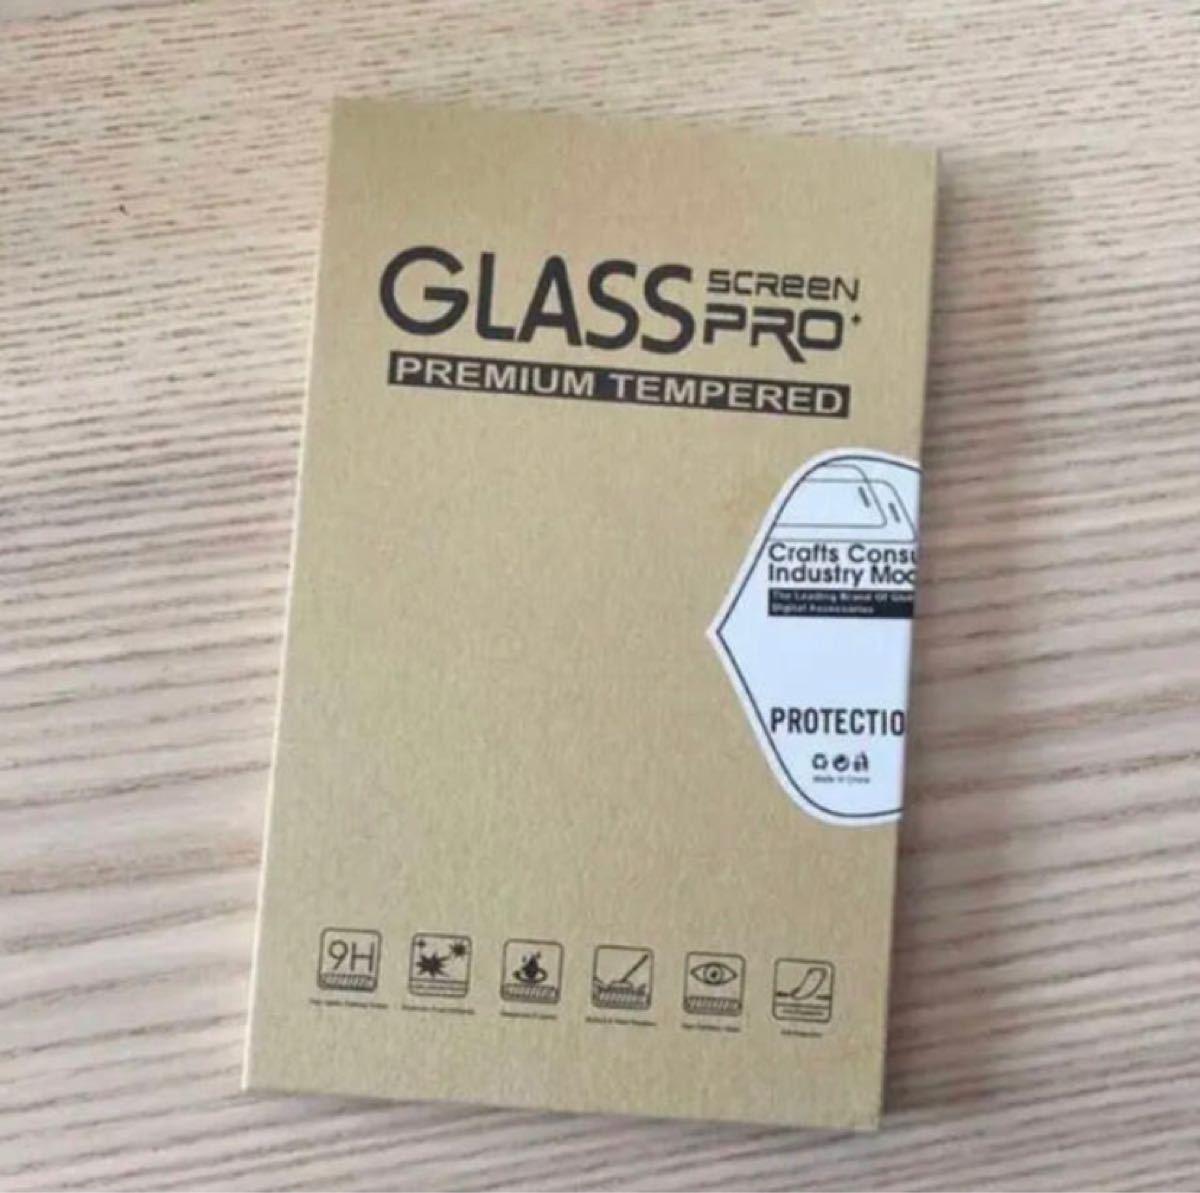 Nintendo Switch 液晶保護フィルム 保護フィルム ニンテンドースイッチ ガラスフィルム ブルーカット 人気商品!